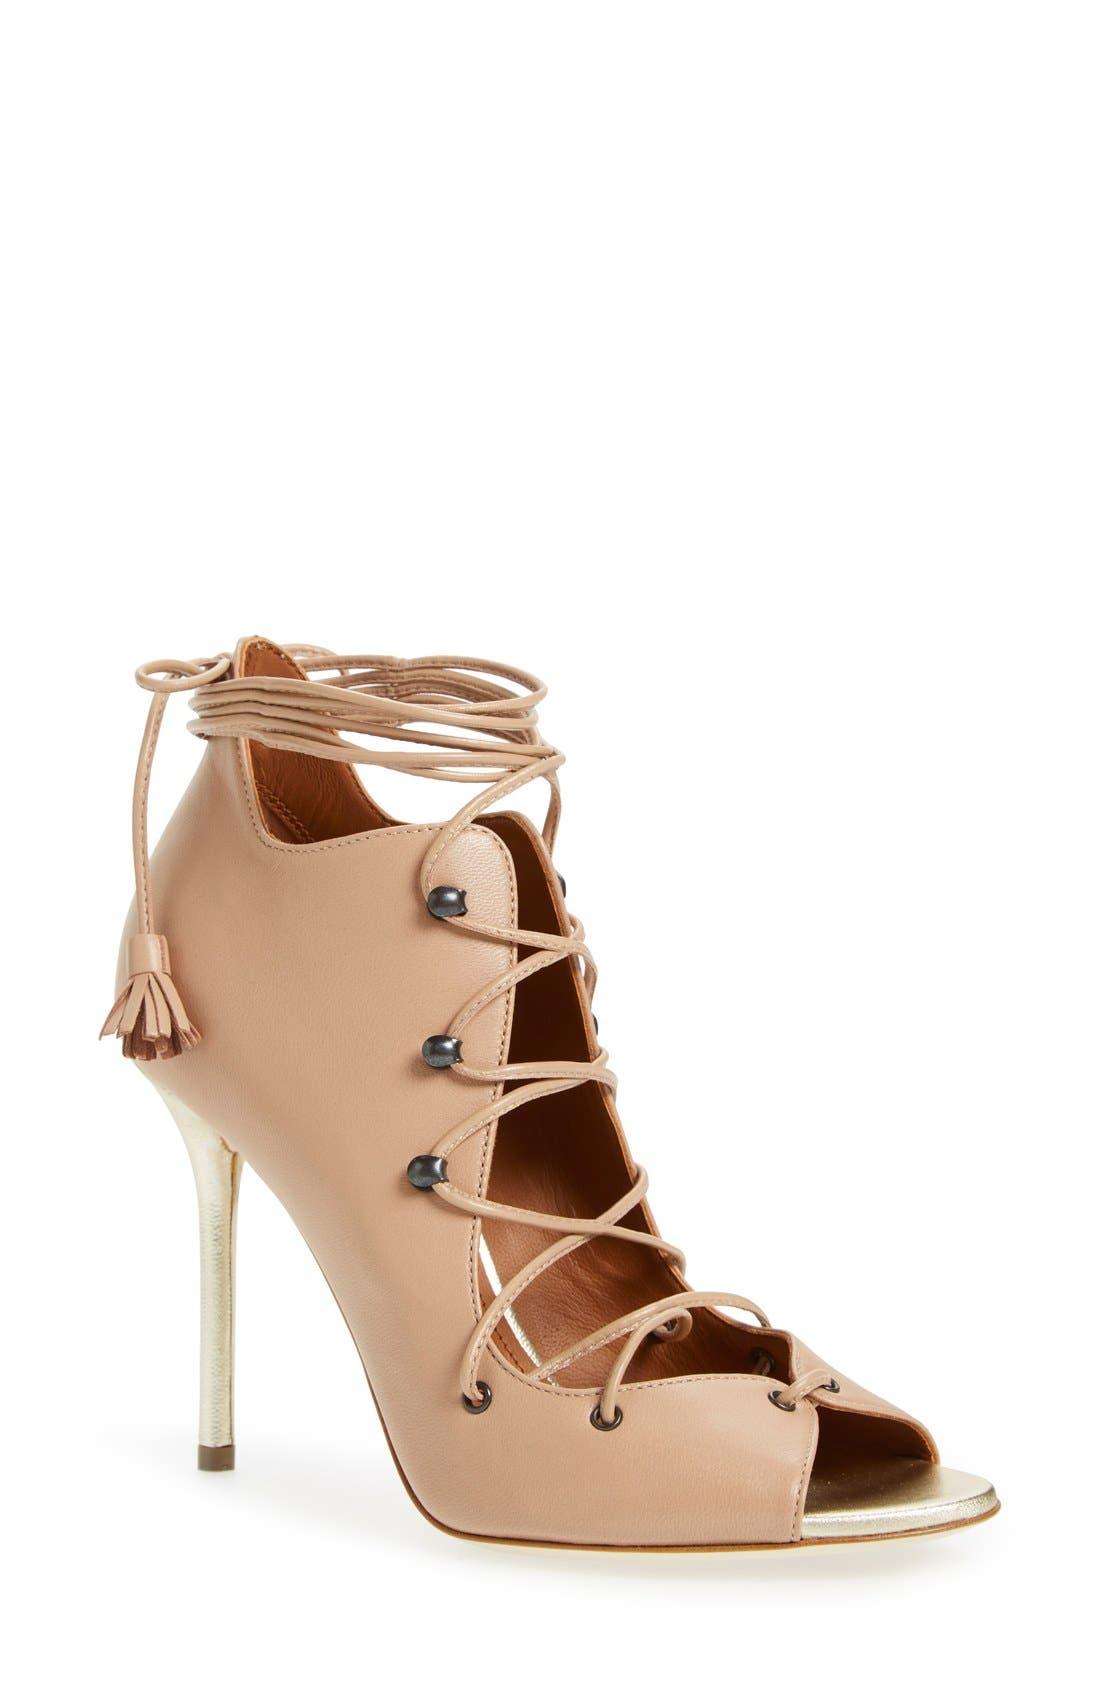 Alternate Image 1 Selected - Malone Souliers 'Savannah' Lace-Up Sandal (Women)